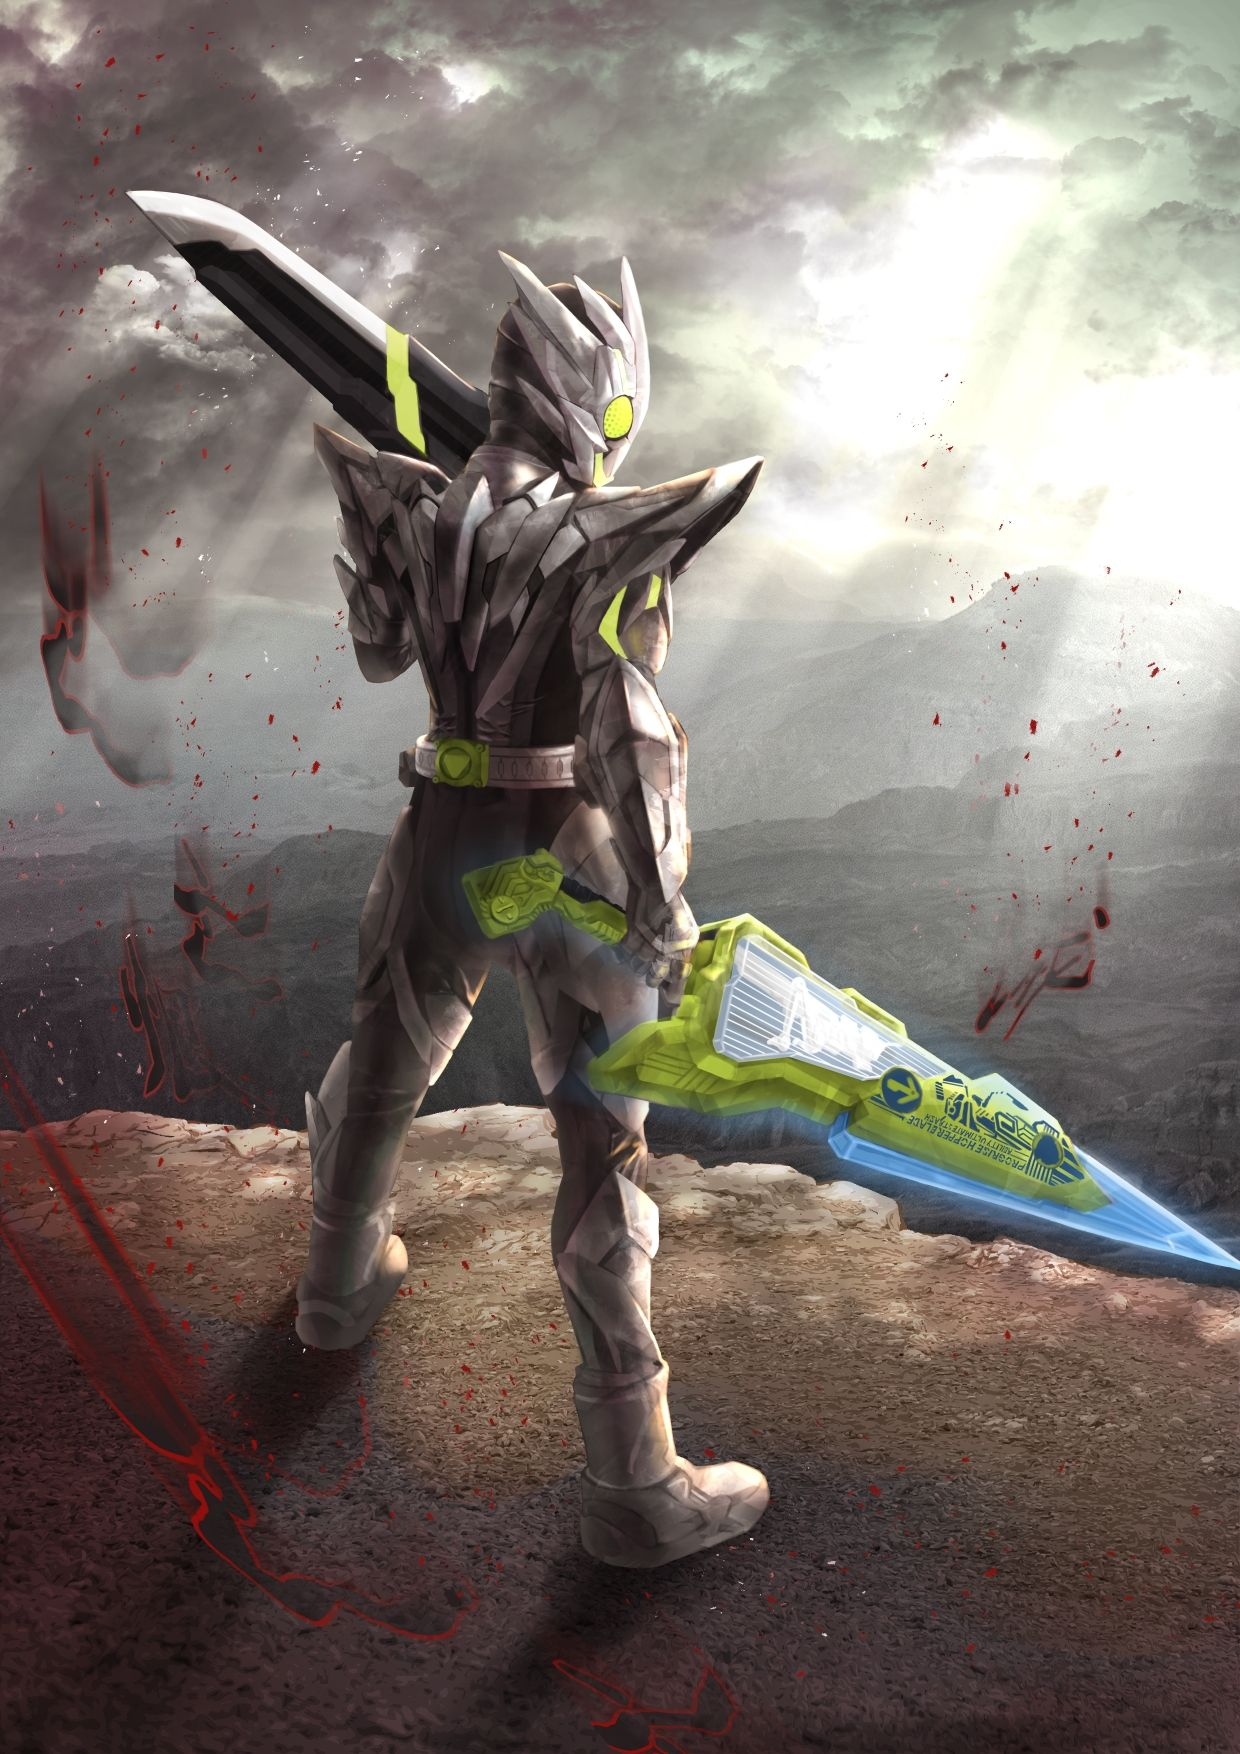 kamen rider zero one metal cluster hopper 仮面ライダー イラスト fgo キャラ